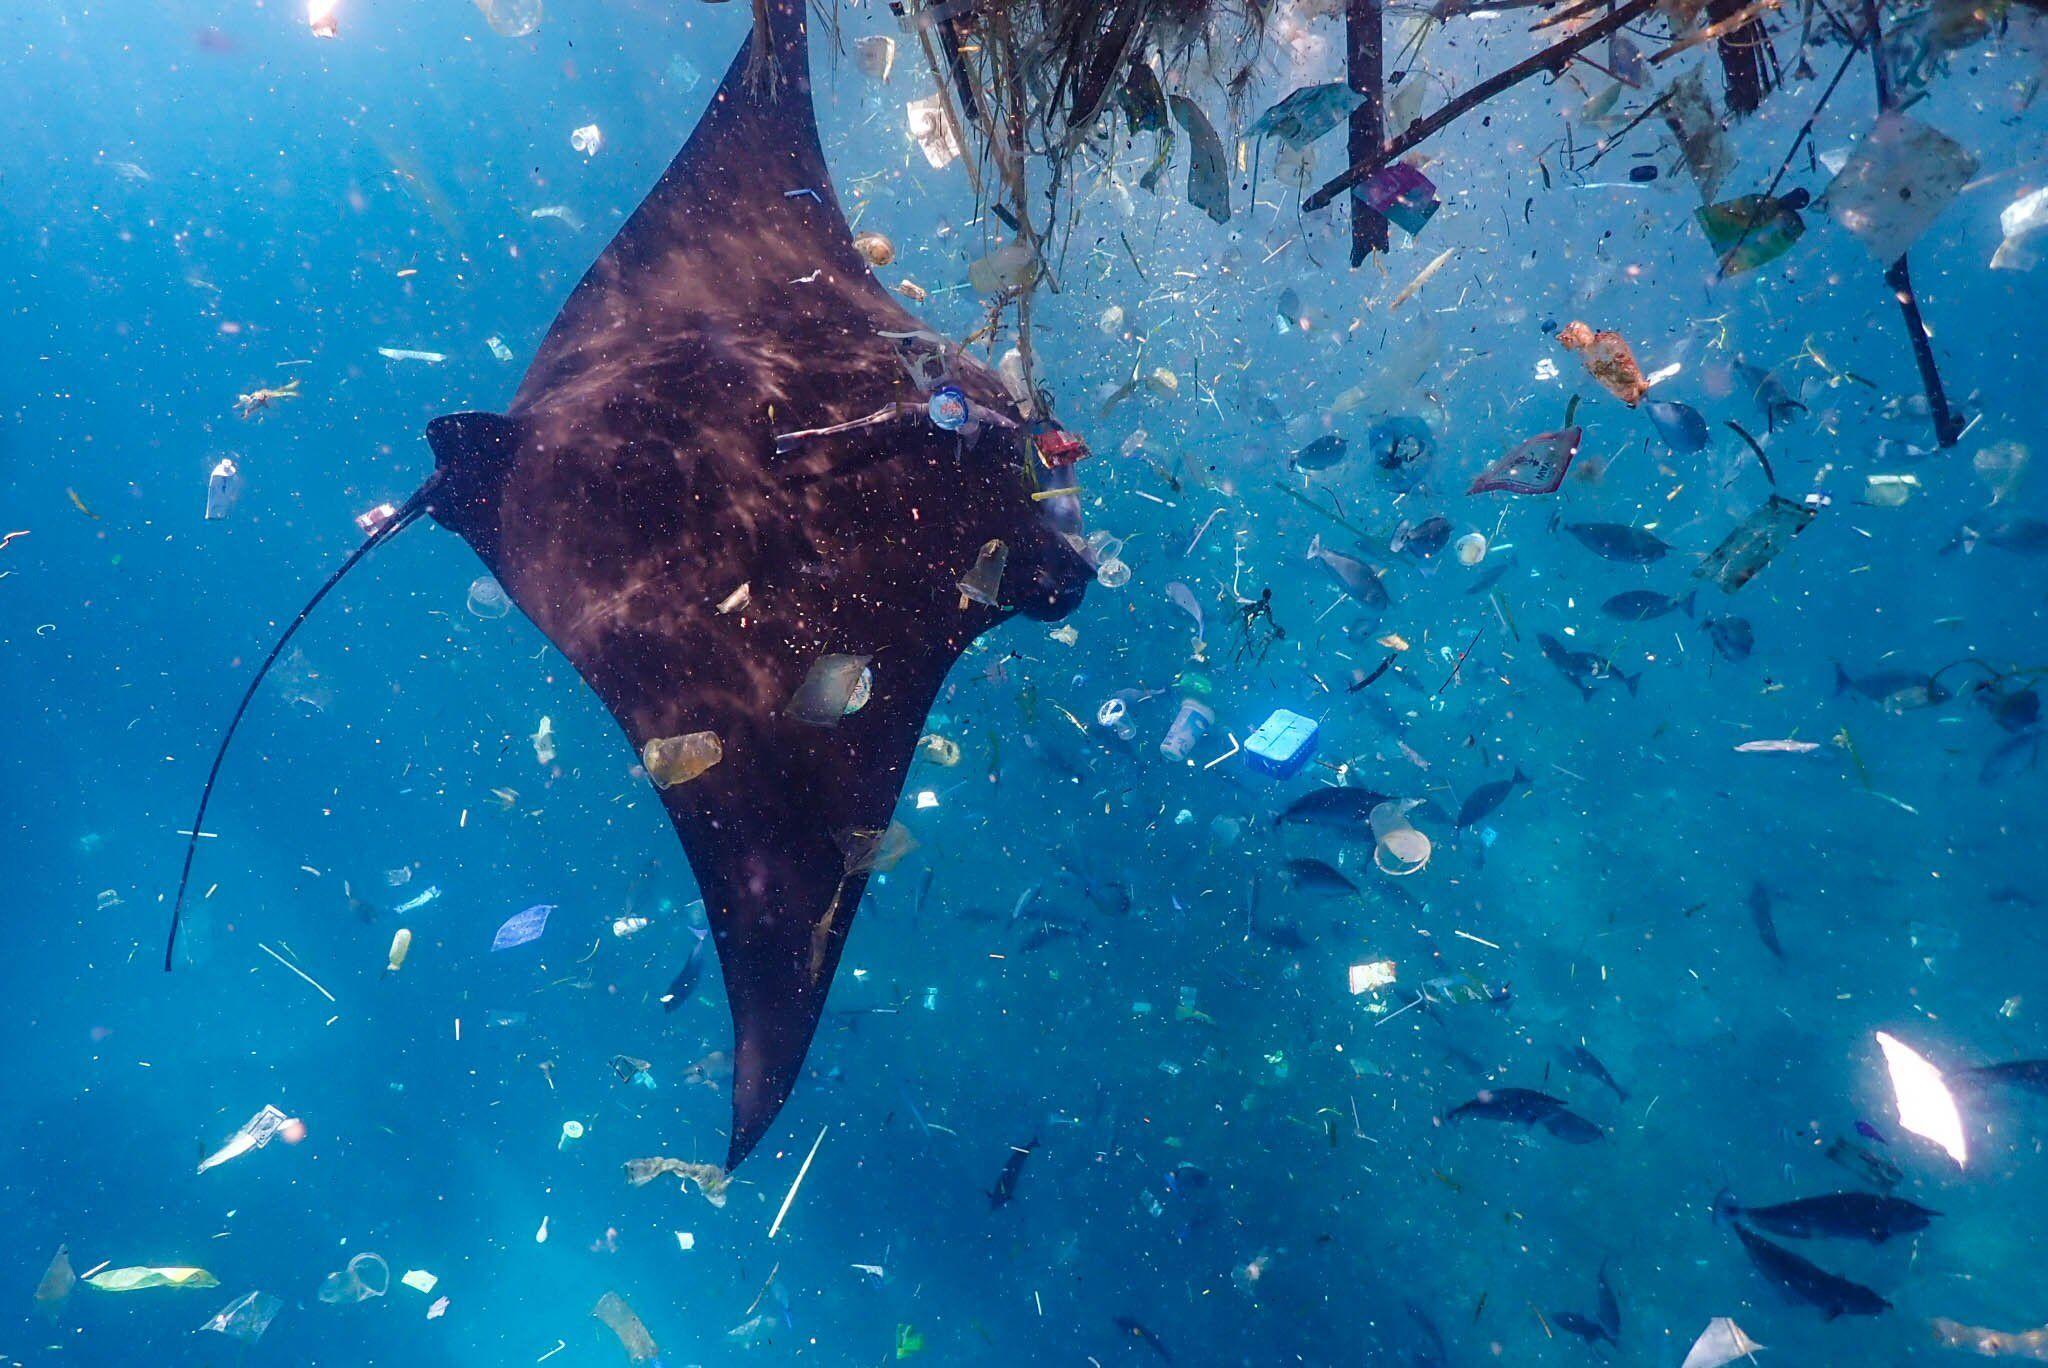 Manta Ray swimming through trash by Oceanic Brooke on Creative Market trash